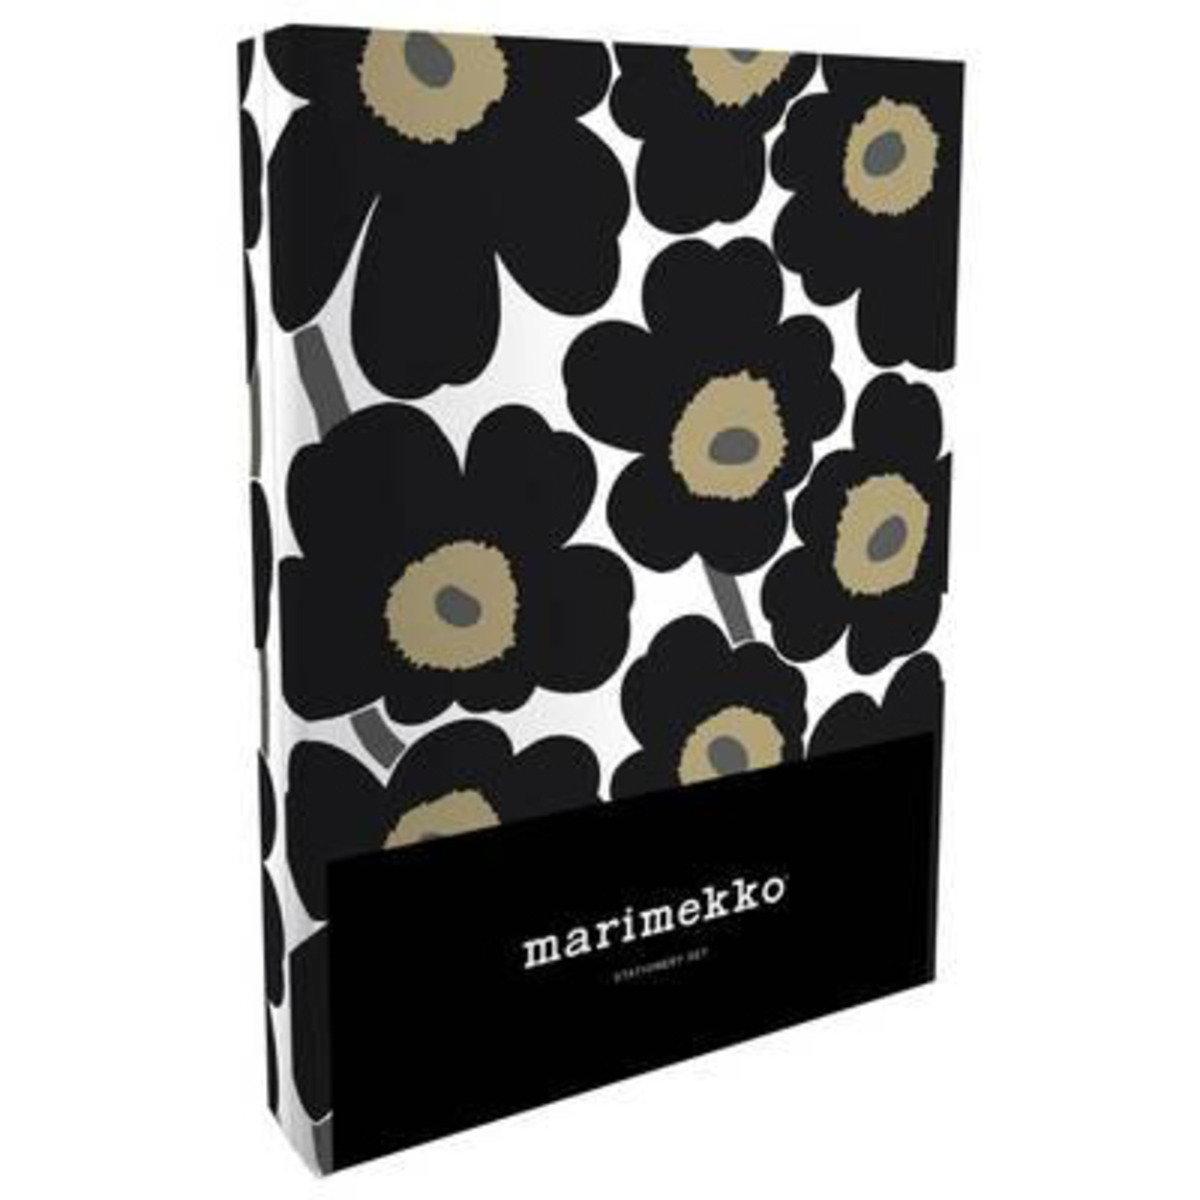 Marimekko Stationery Box